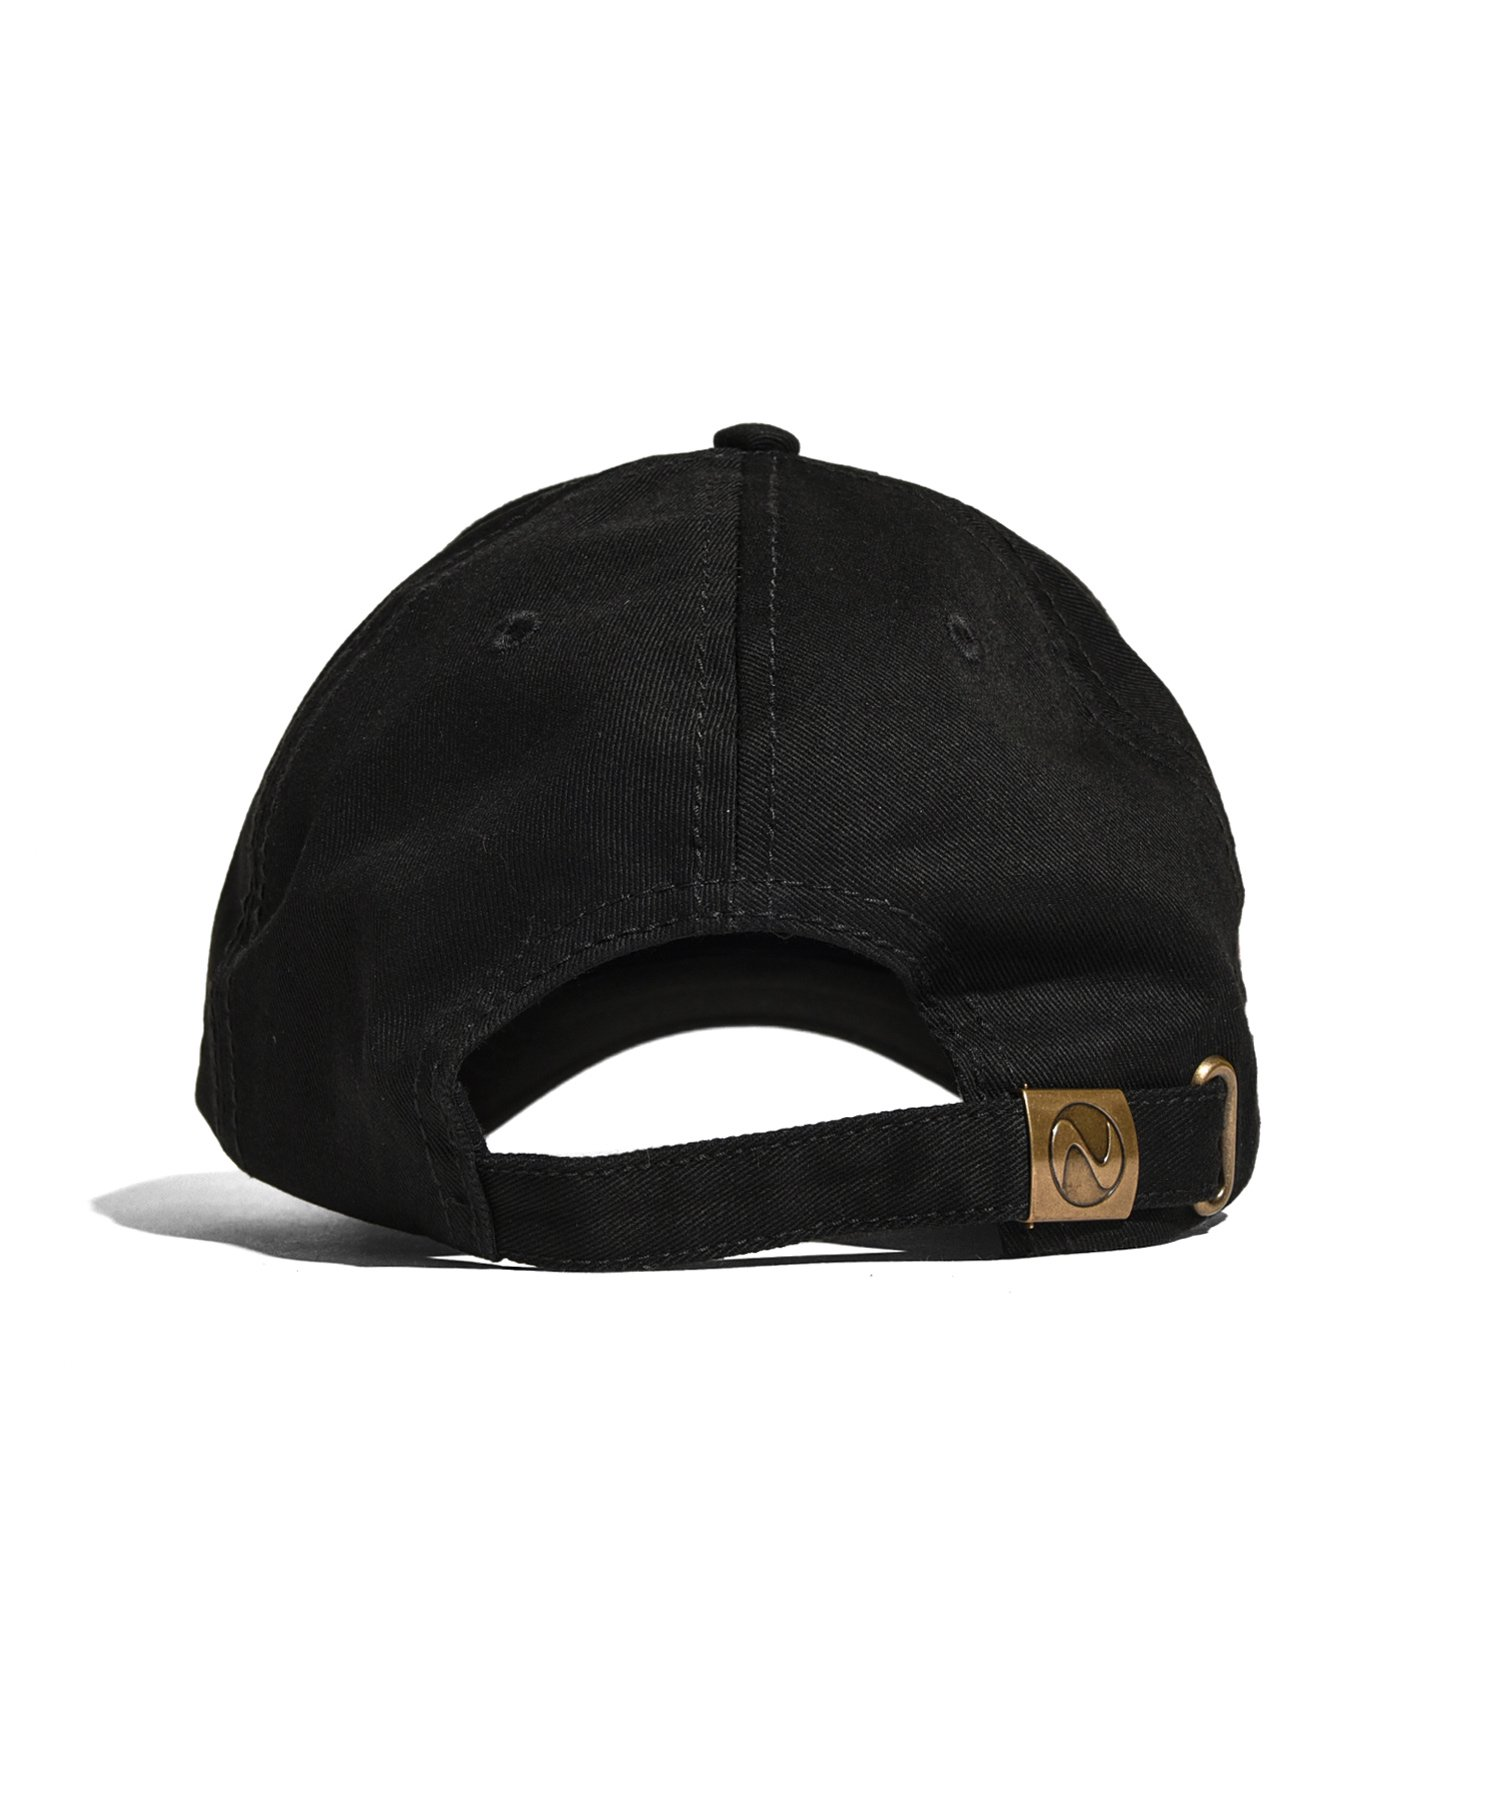 DLSM BOOMERANG LOGO CAP